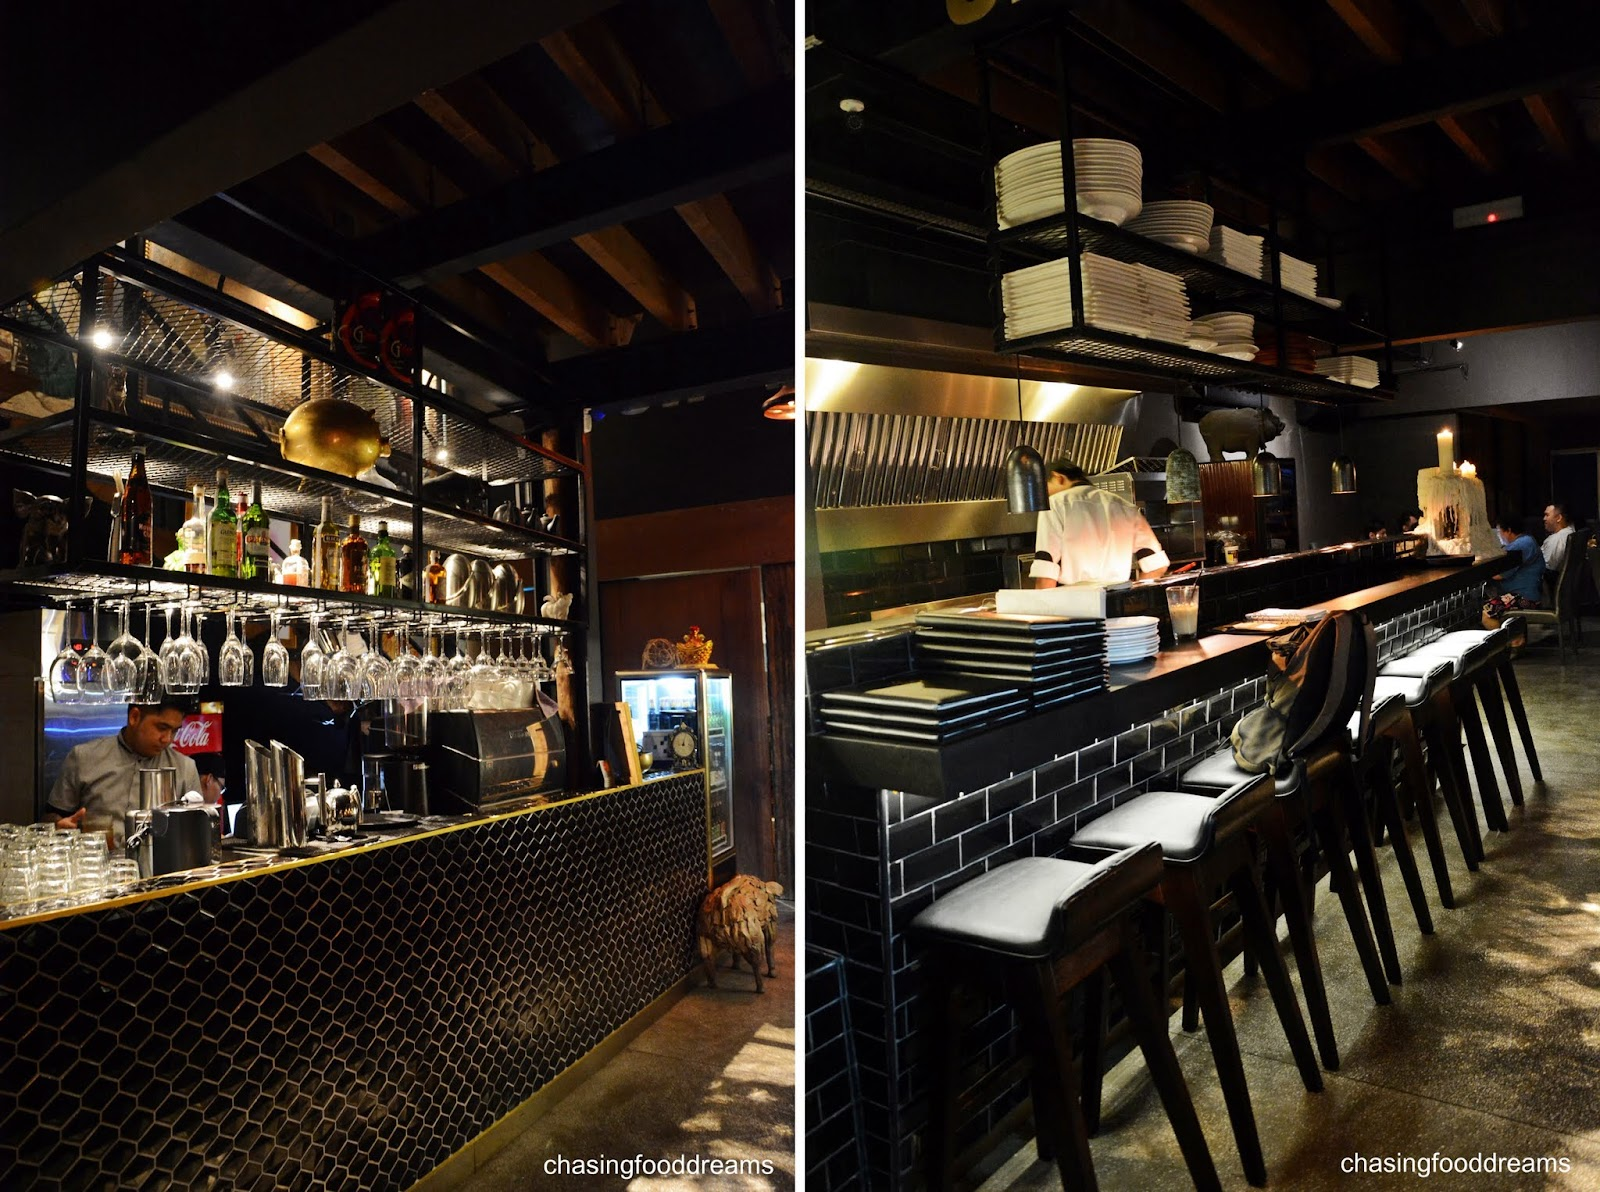 Artistic Kitchen Bar